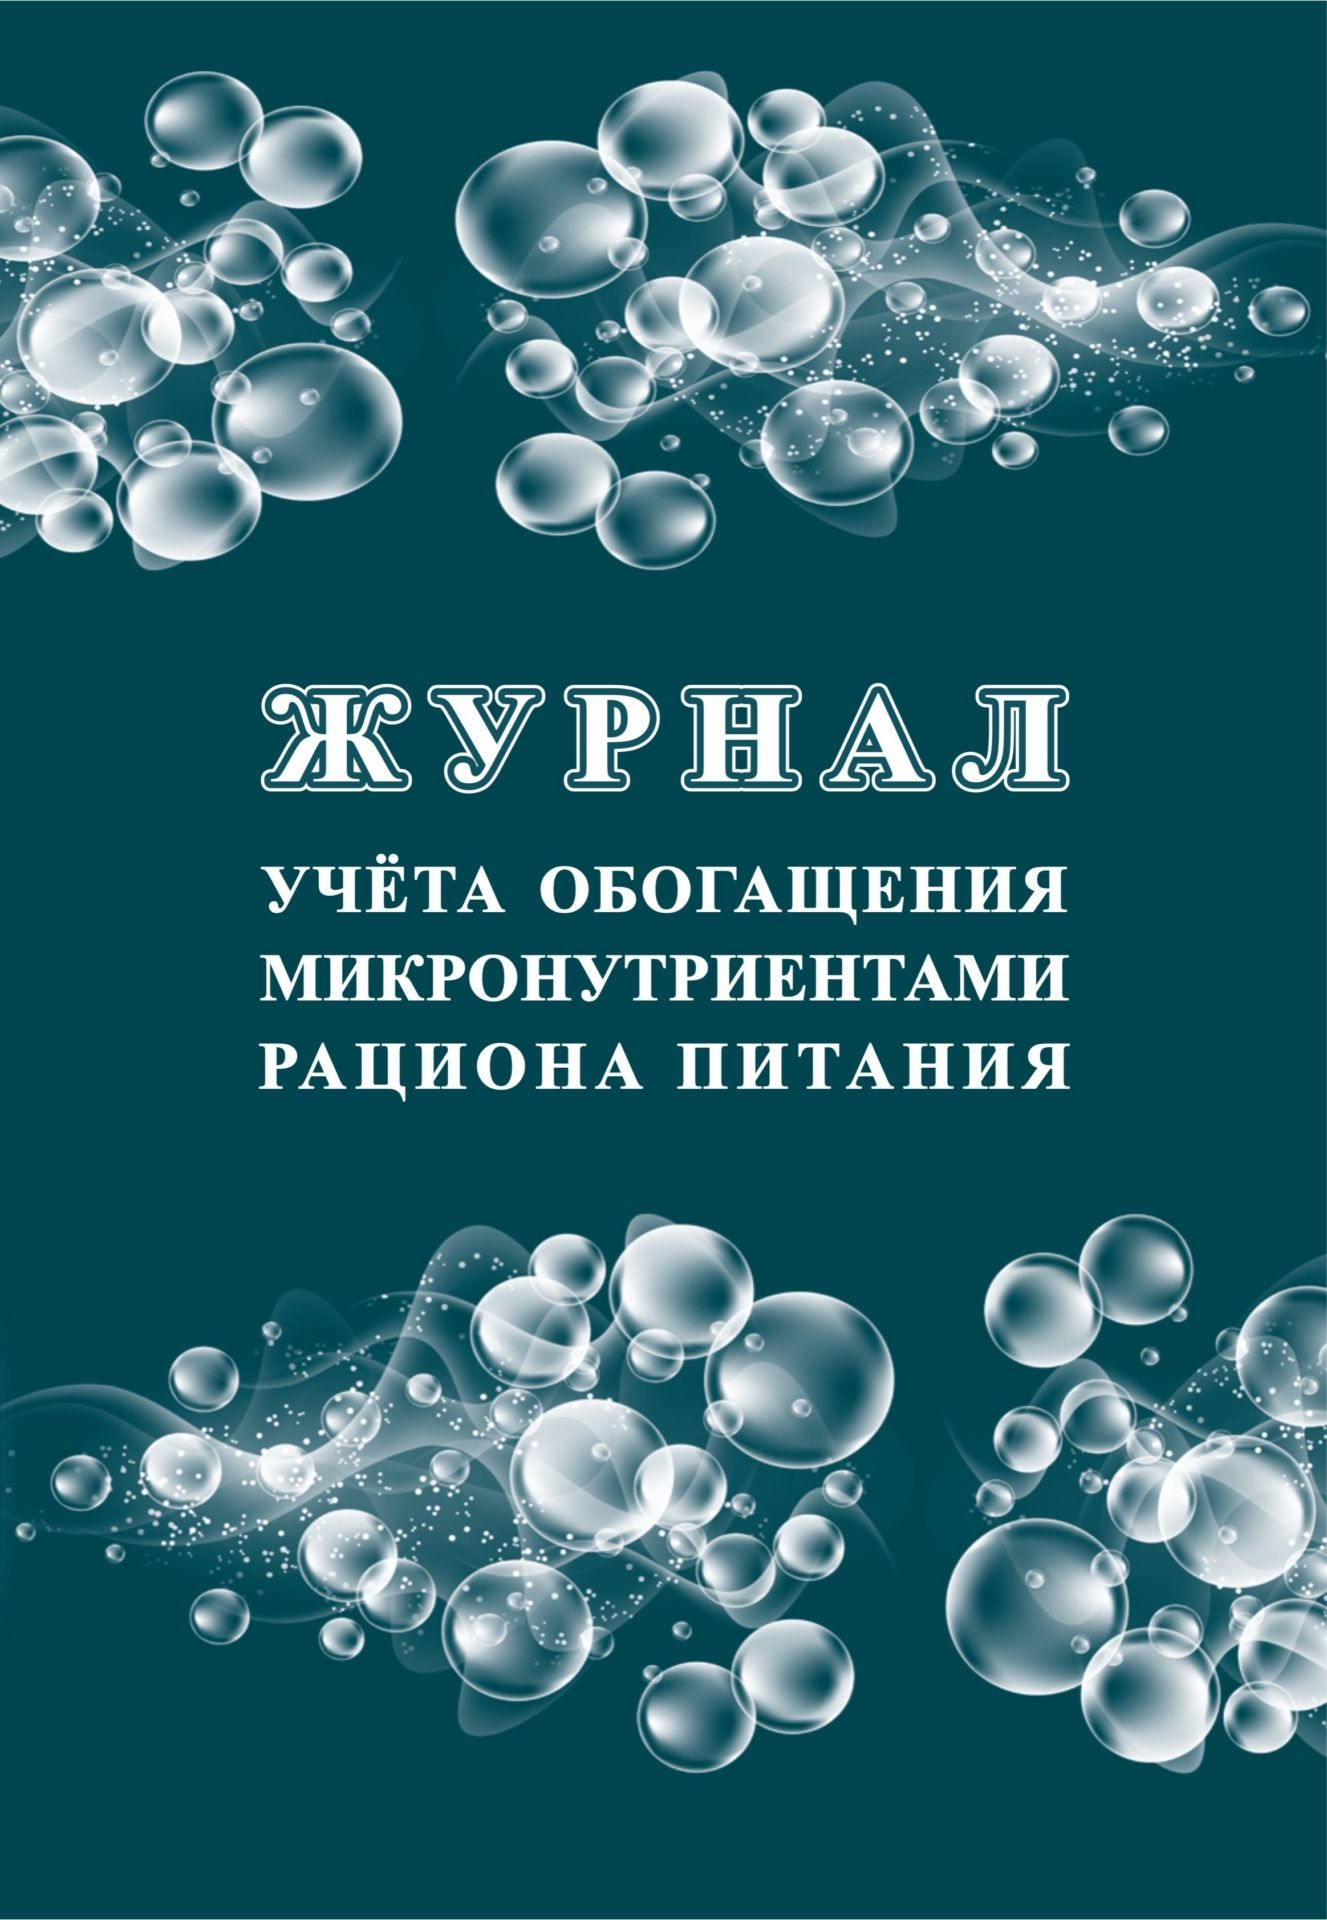 Журнал учёта обогащения микронутриентами рациона питания